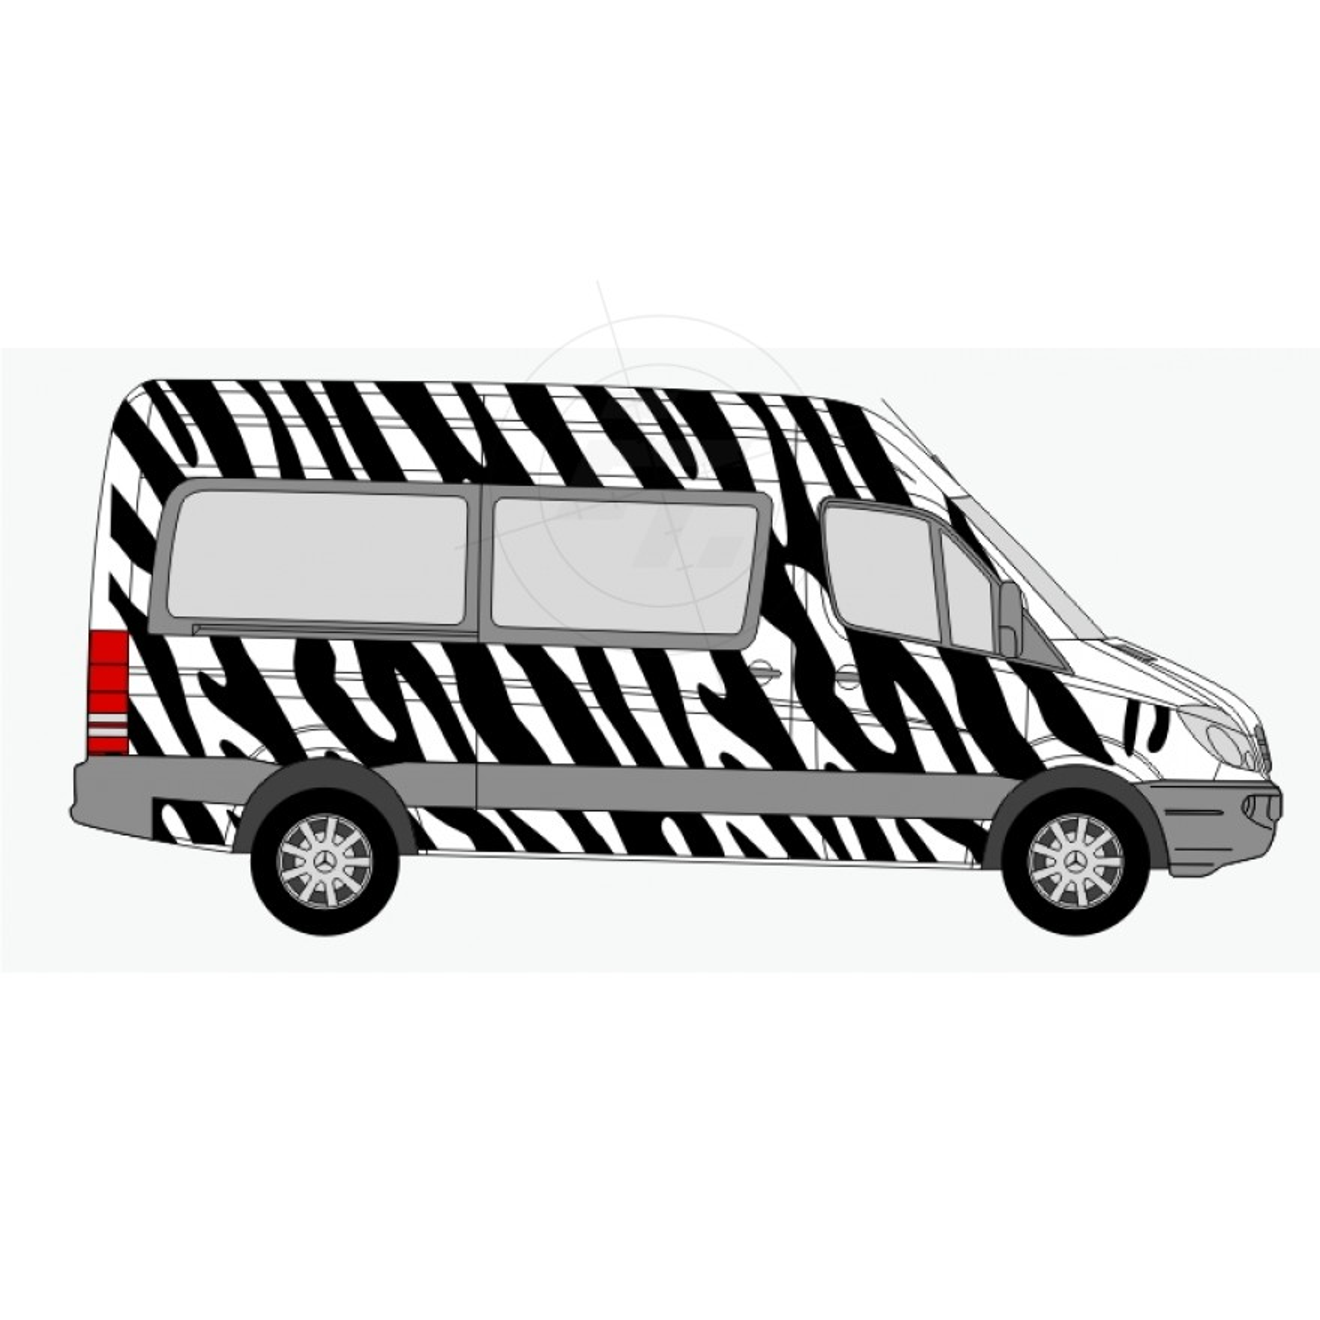 zebrafell aufkleber f r auto pkw kfz transporter caravan. Black Bedroom Furniture Sets. Home Design Ideas